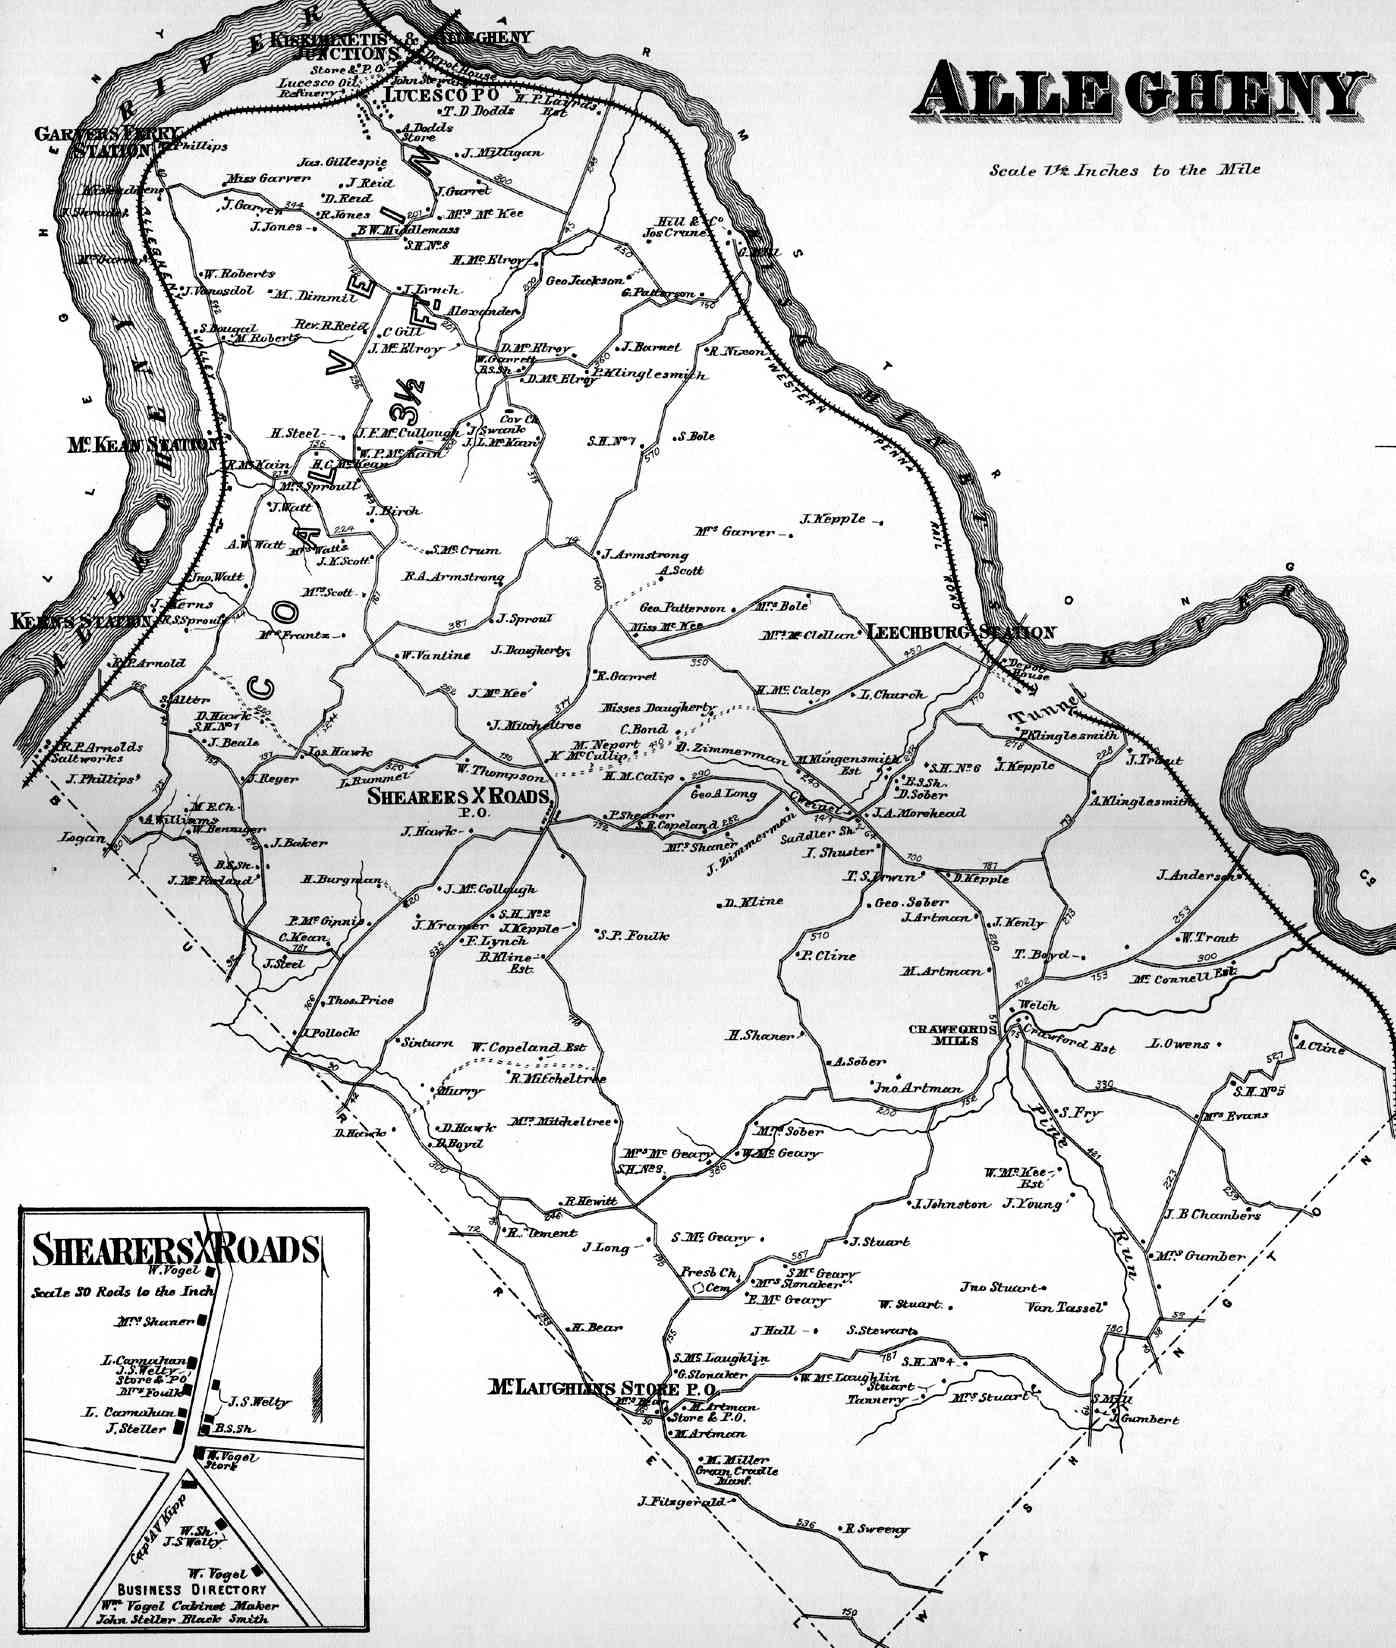 Westmoreland County Pennsylvania Atlas, 1867 on state of pa map, cowansville pa map, schuylkill river pa map, north strabane pa map, baldwin pa map, manns choice pa map, york pa map, centre hall pa map, huntingdon valley pa map, emporium pa map, bear rocks pa map, bucks co pa map, south hills pa map, karns city pa map, barkeyville pa map, red land pa map, hilliards pa map, greensburg pa map, rosslyn farms pa map, east pittsburgh pa map,